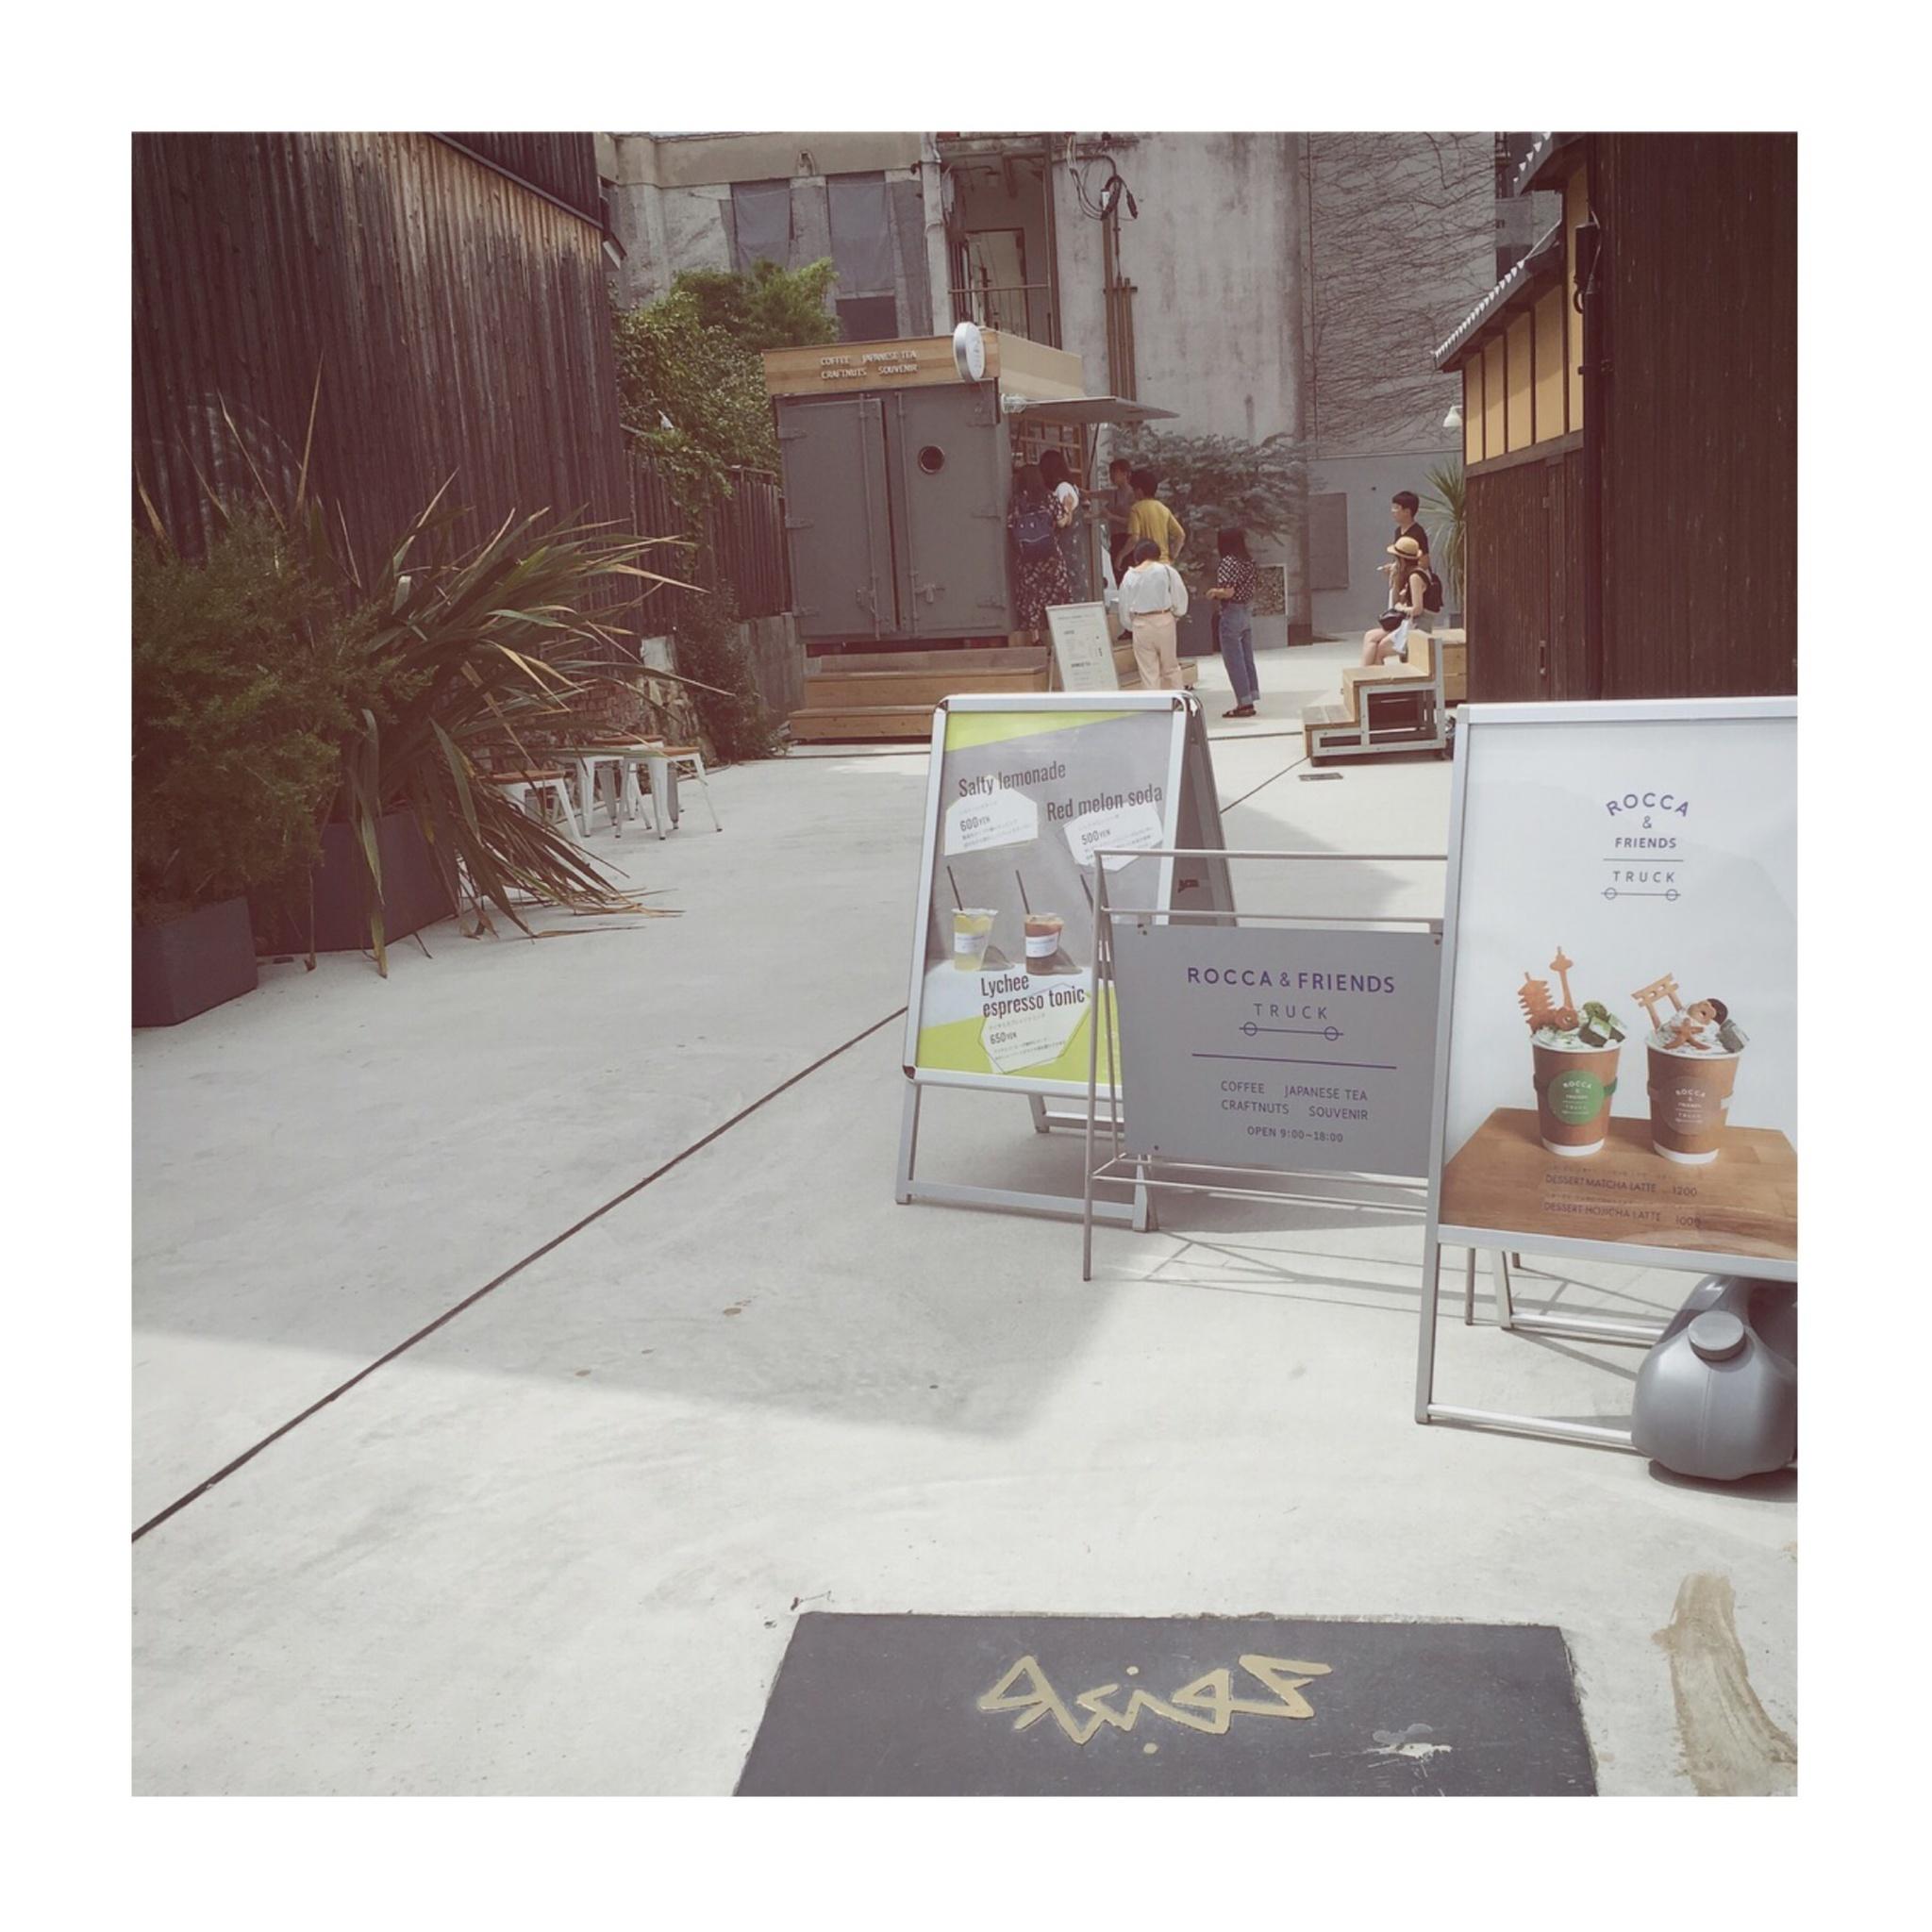 #5【#cafestagram】❤️:《京都》に行ったら絶対飲みたい!ROCCA&FRIENDS TRUCKの抹茶ラテがかわいすぎる◡̈_1